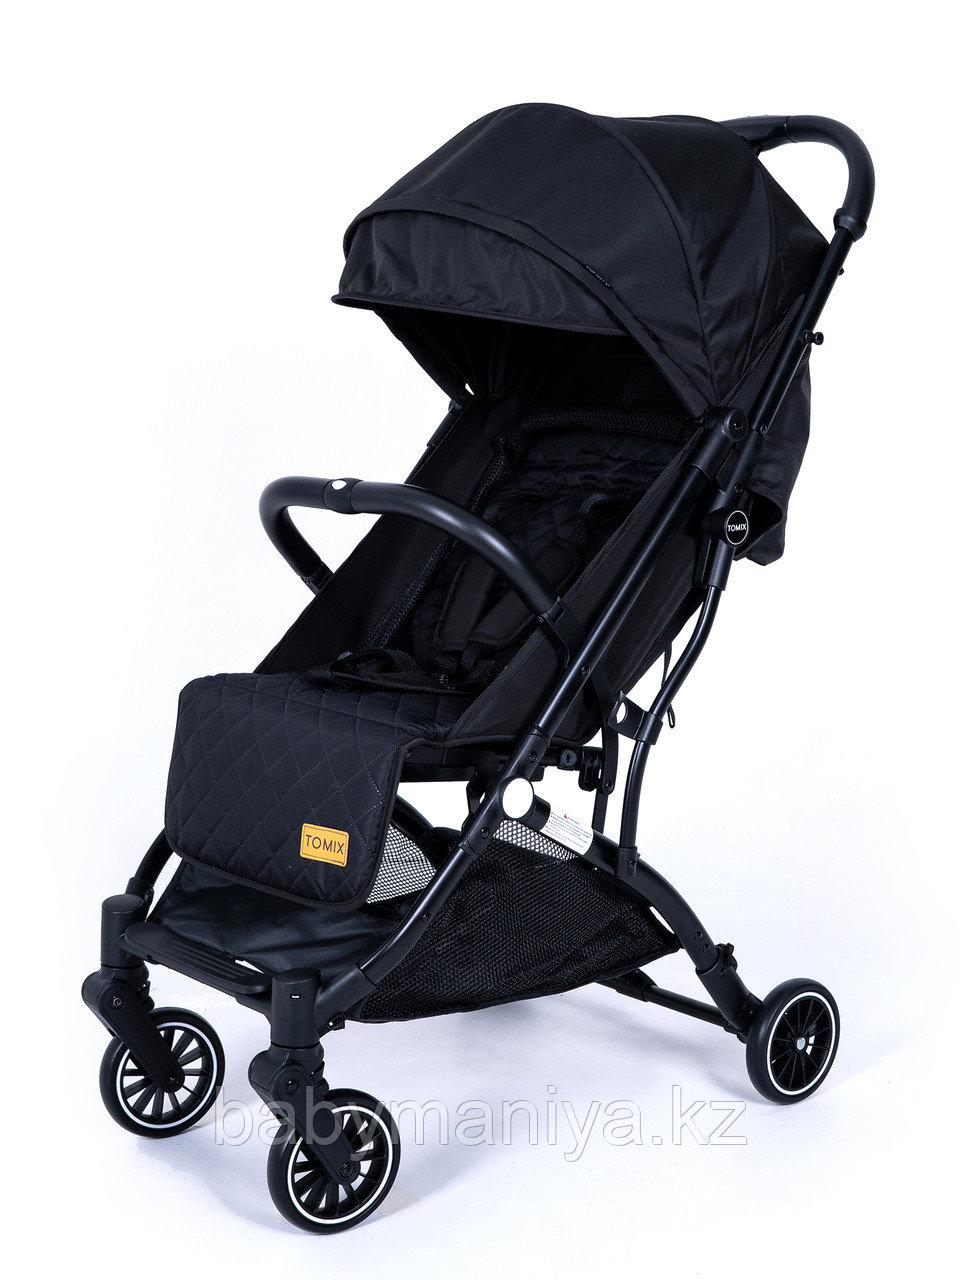 Прогулочная коляска Tomix LUNA (Black)